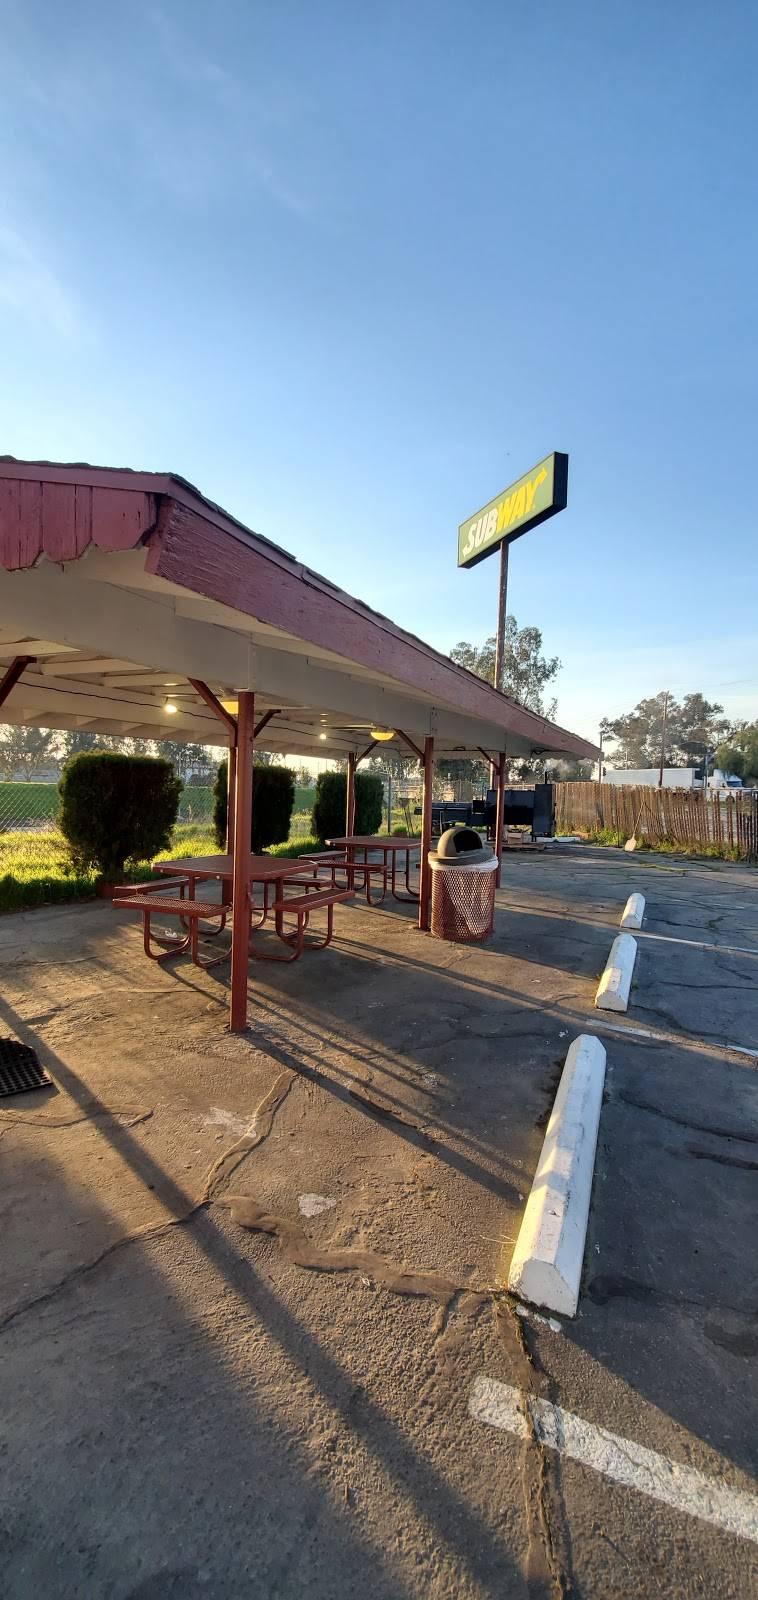 S&T BBQ Delights Restaurant - restaurant  | Photo 3 of 7 | Address: 4965 N Barcus Ave, Fresno, CA 93722, USA | Phone: (559) 275-9033